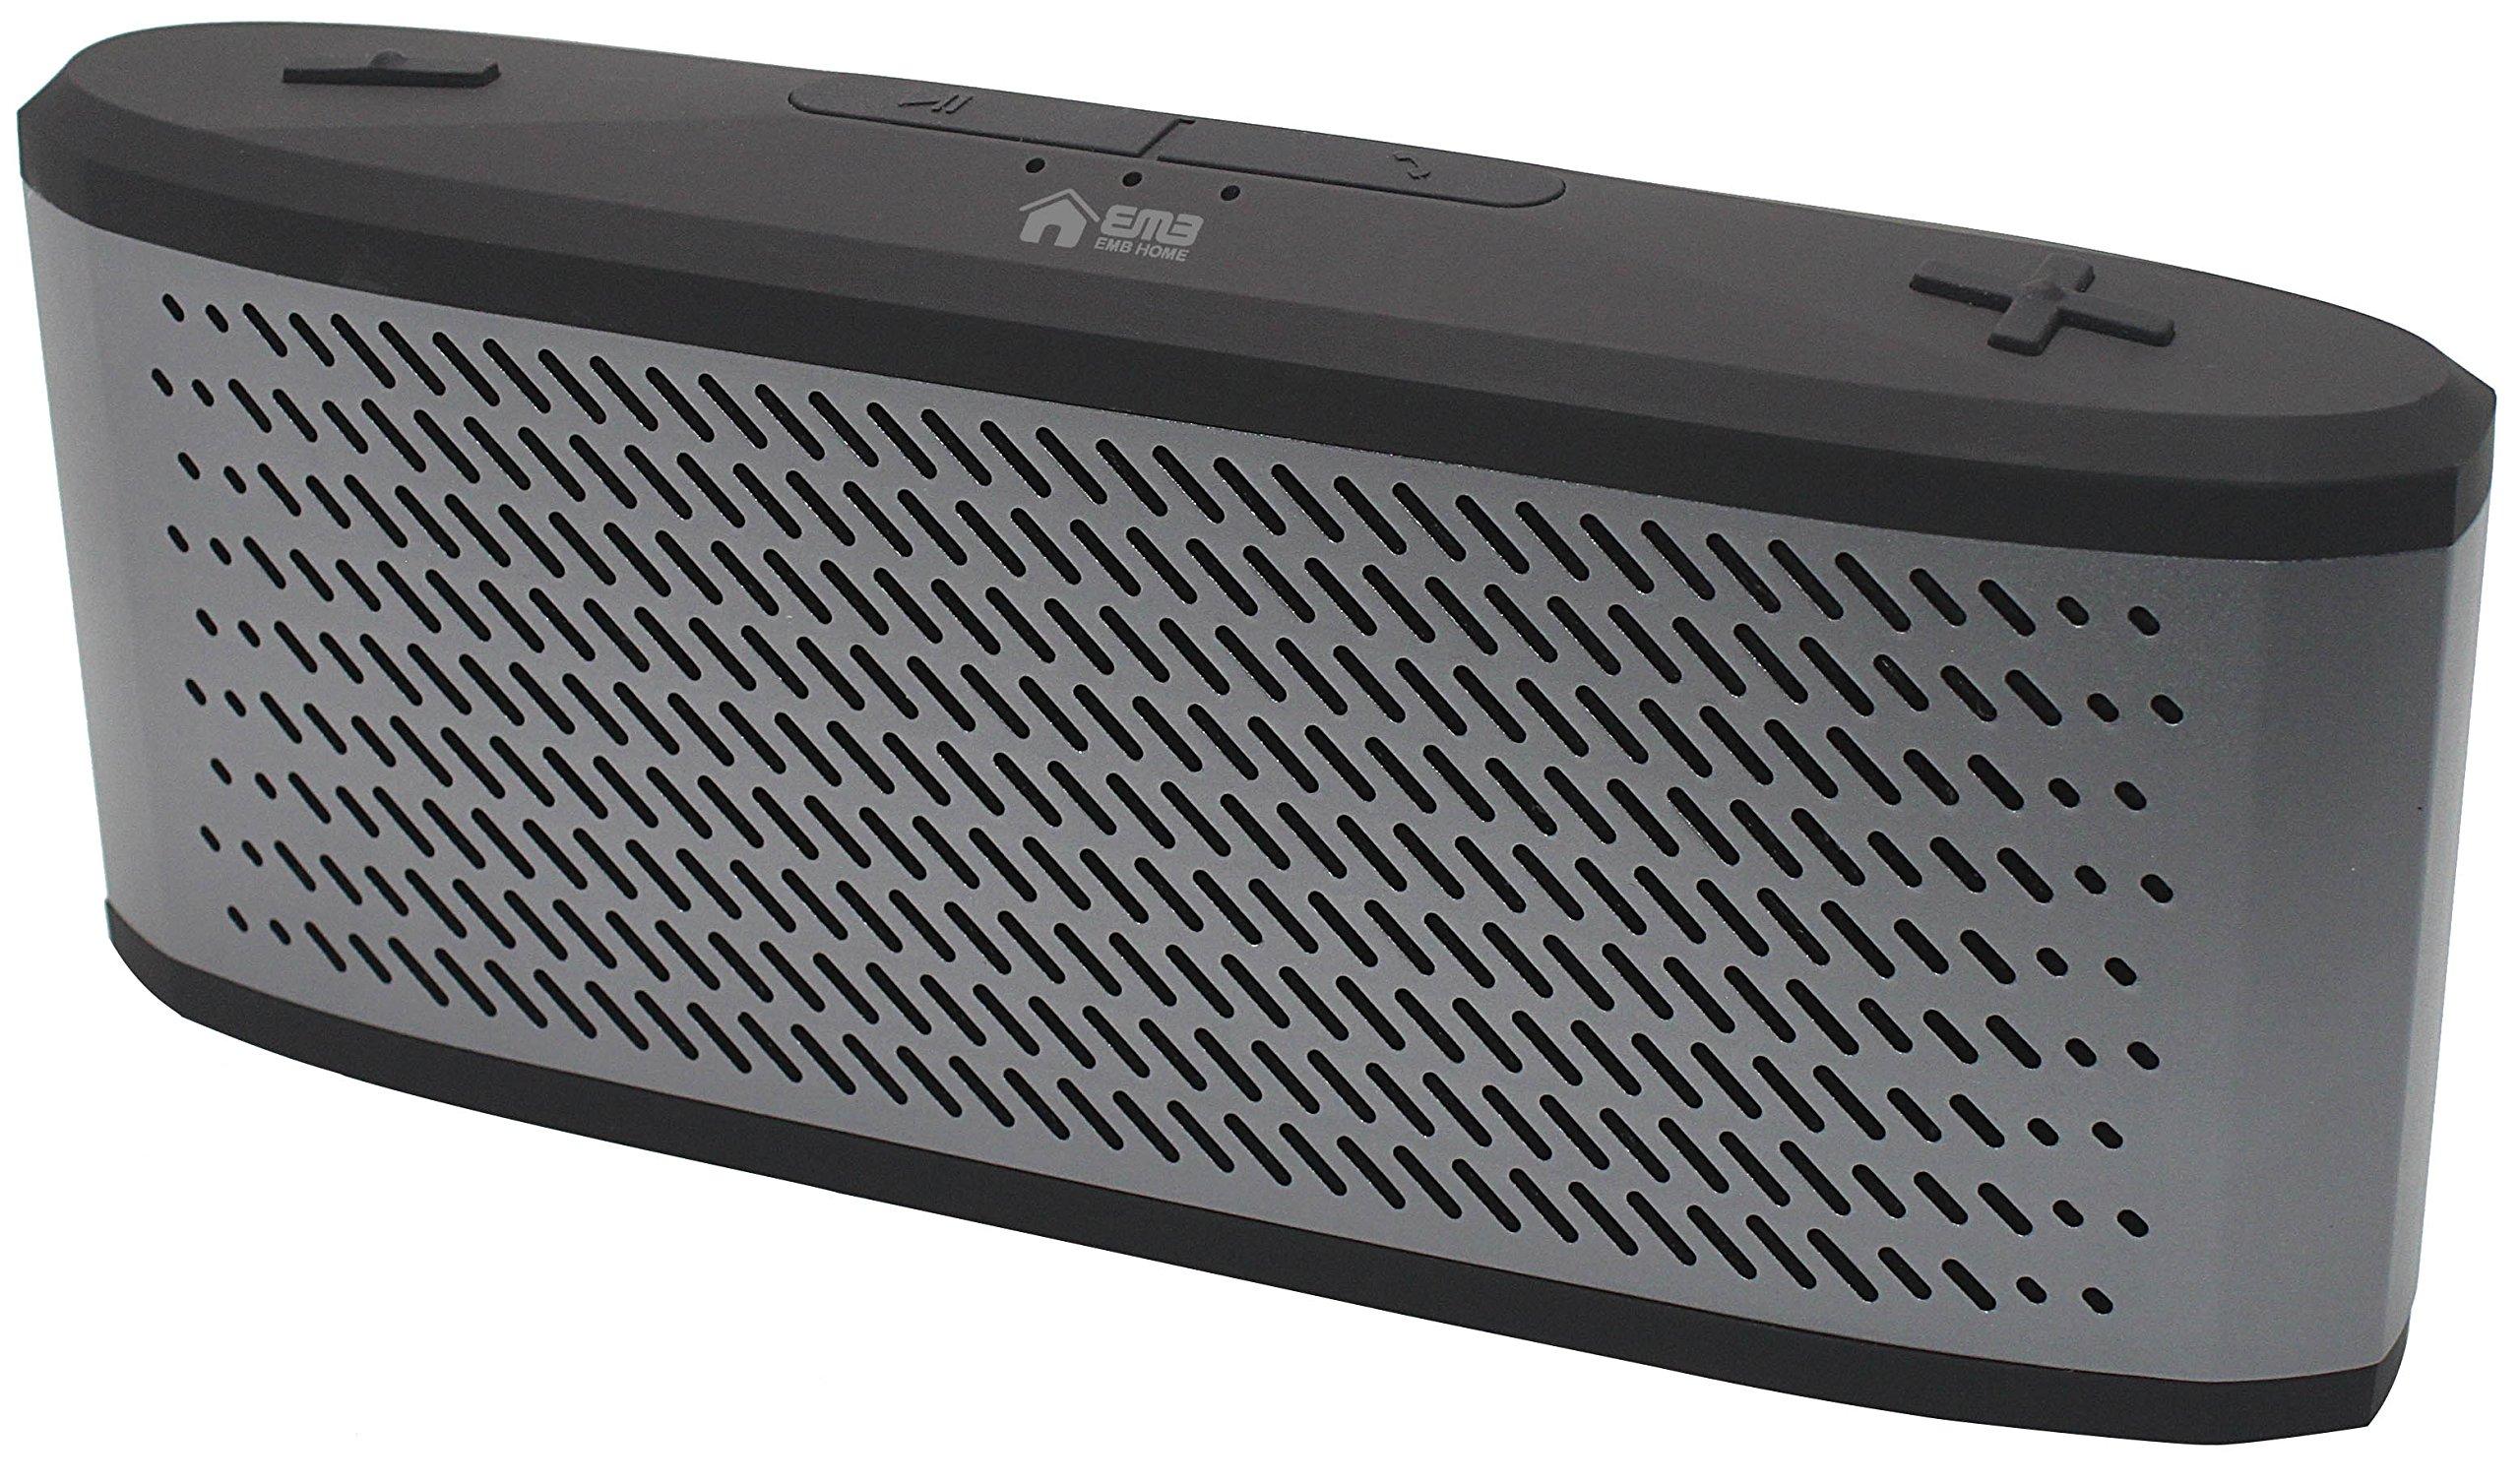 EMB ES950BT-X2 Indoor/Outdoor High-Definition Super Loud Portable Bluetooth Speaker - Grey